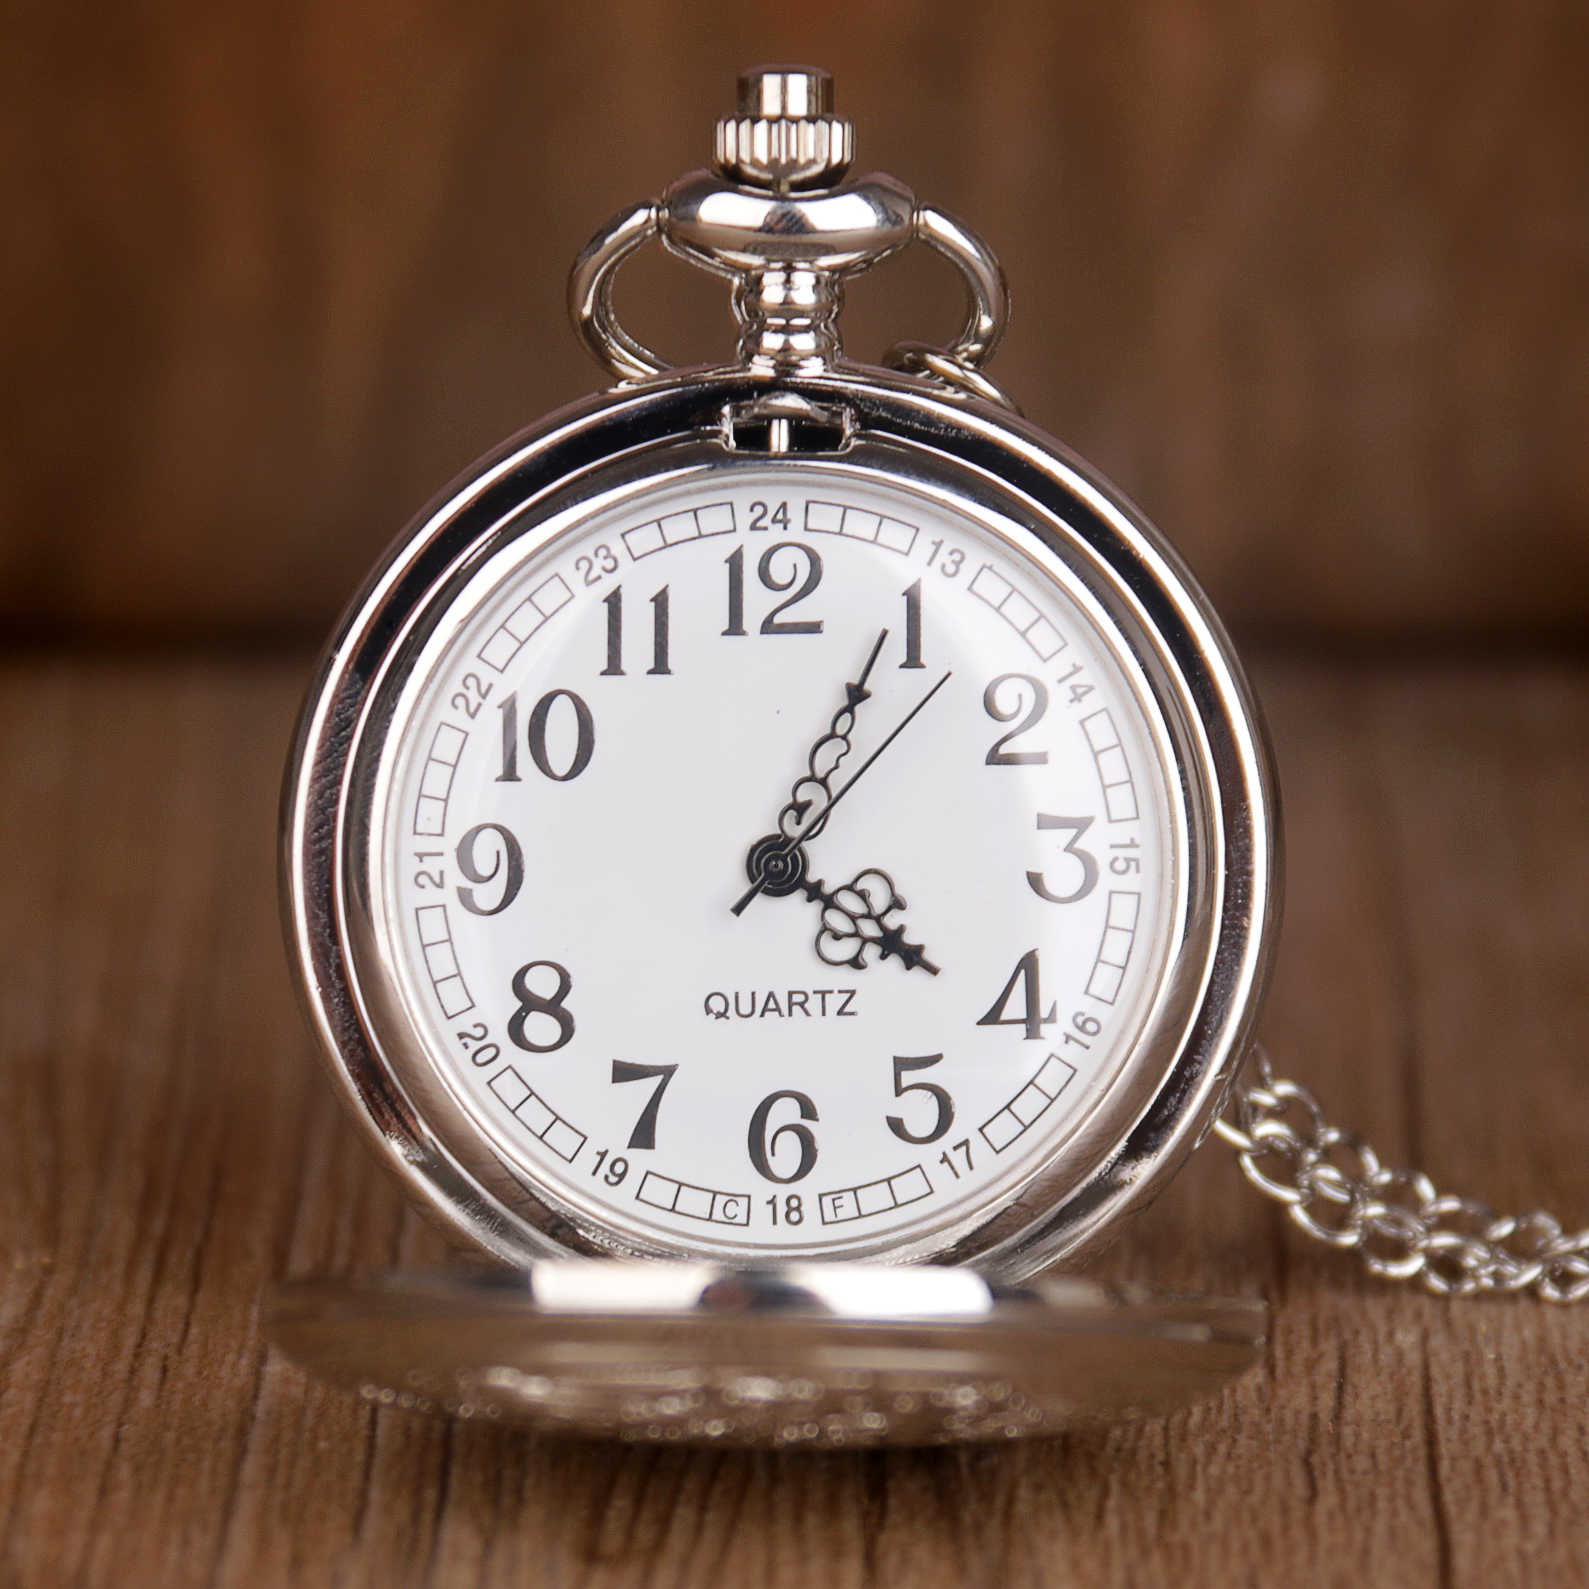 Escultura URSS insignias URSS martillo bolsillo reloj COLLAR COLGANTE cadena reloj moda hombres para regalo TD2020